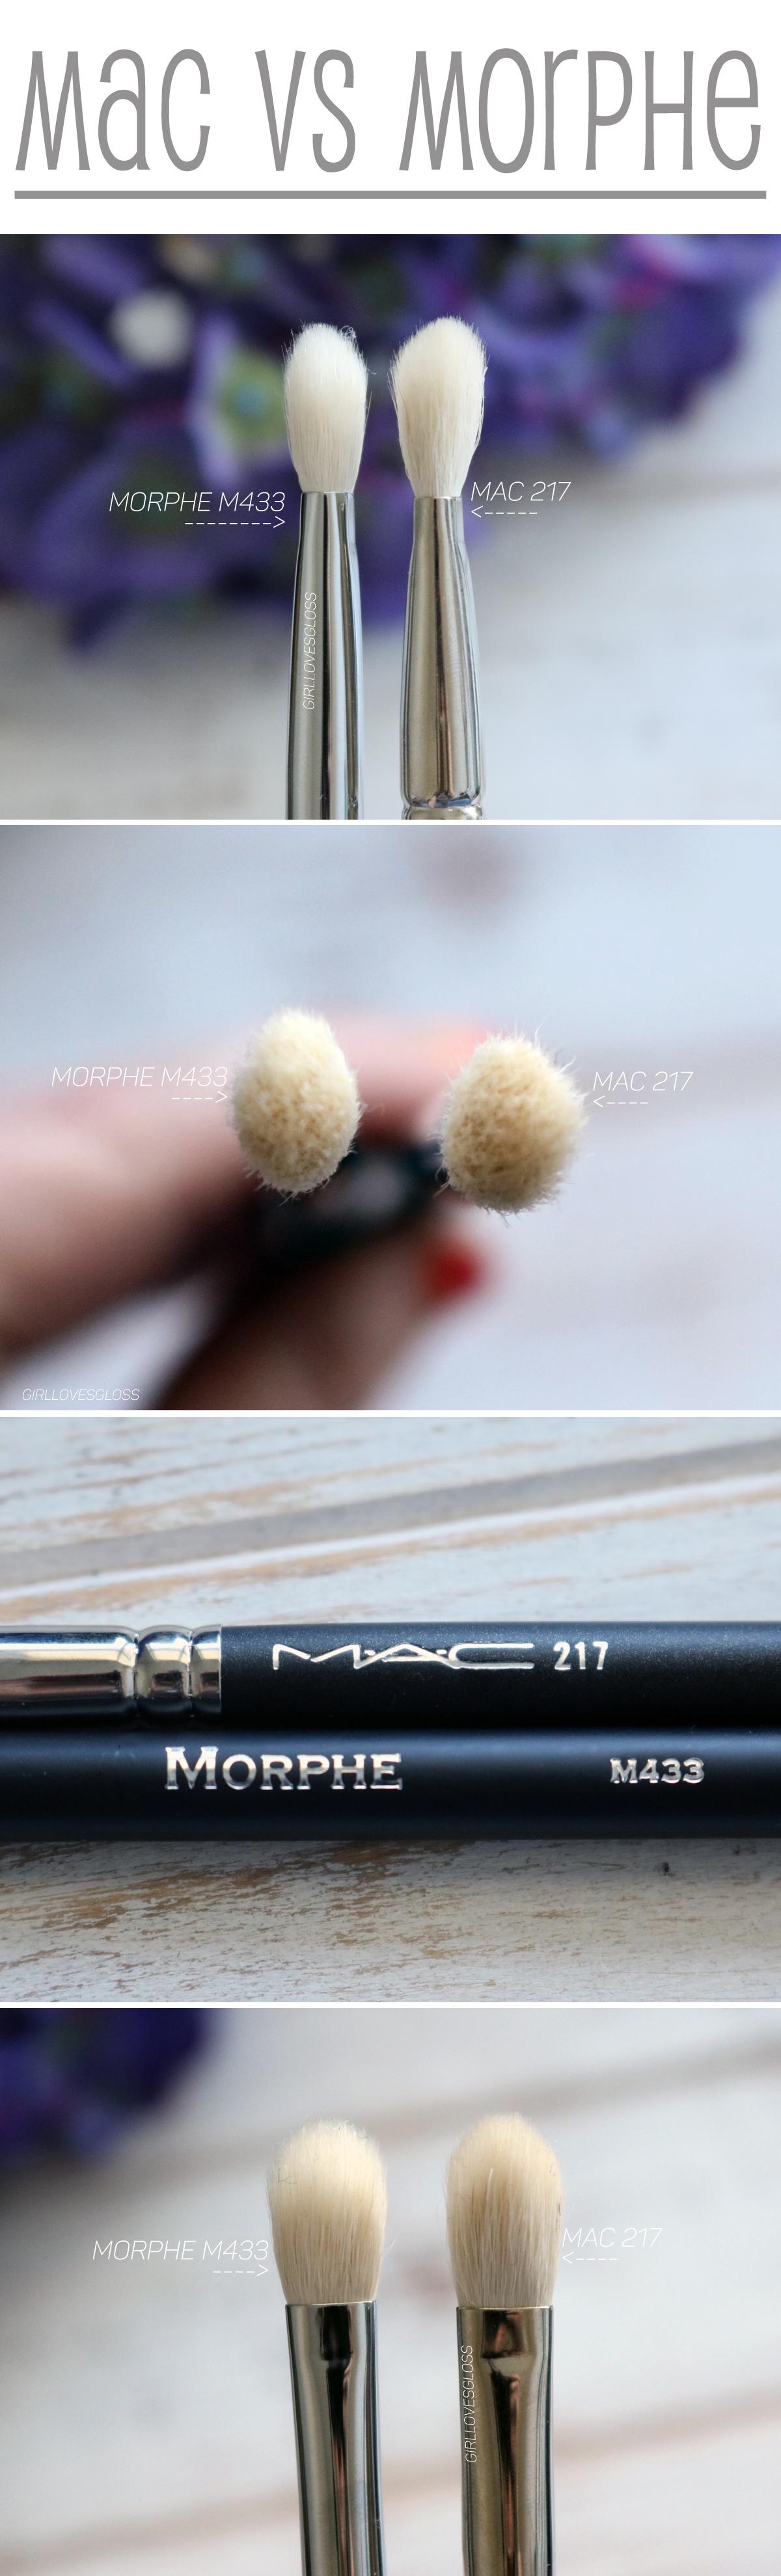 MAC 2017 vs Morphe M433 Brush Review and Comparison